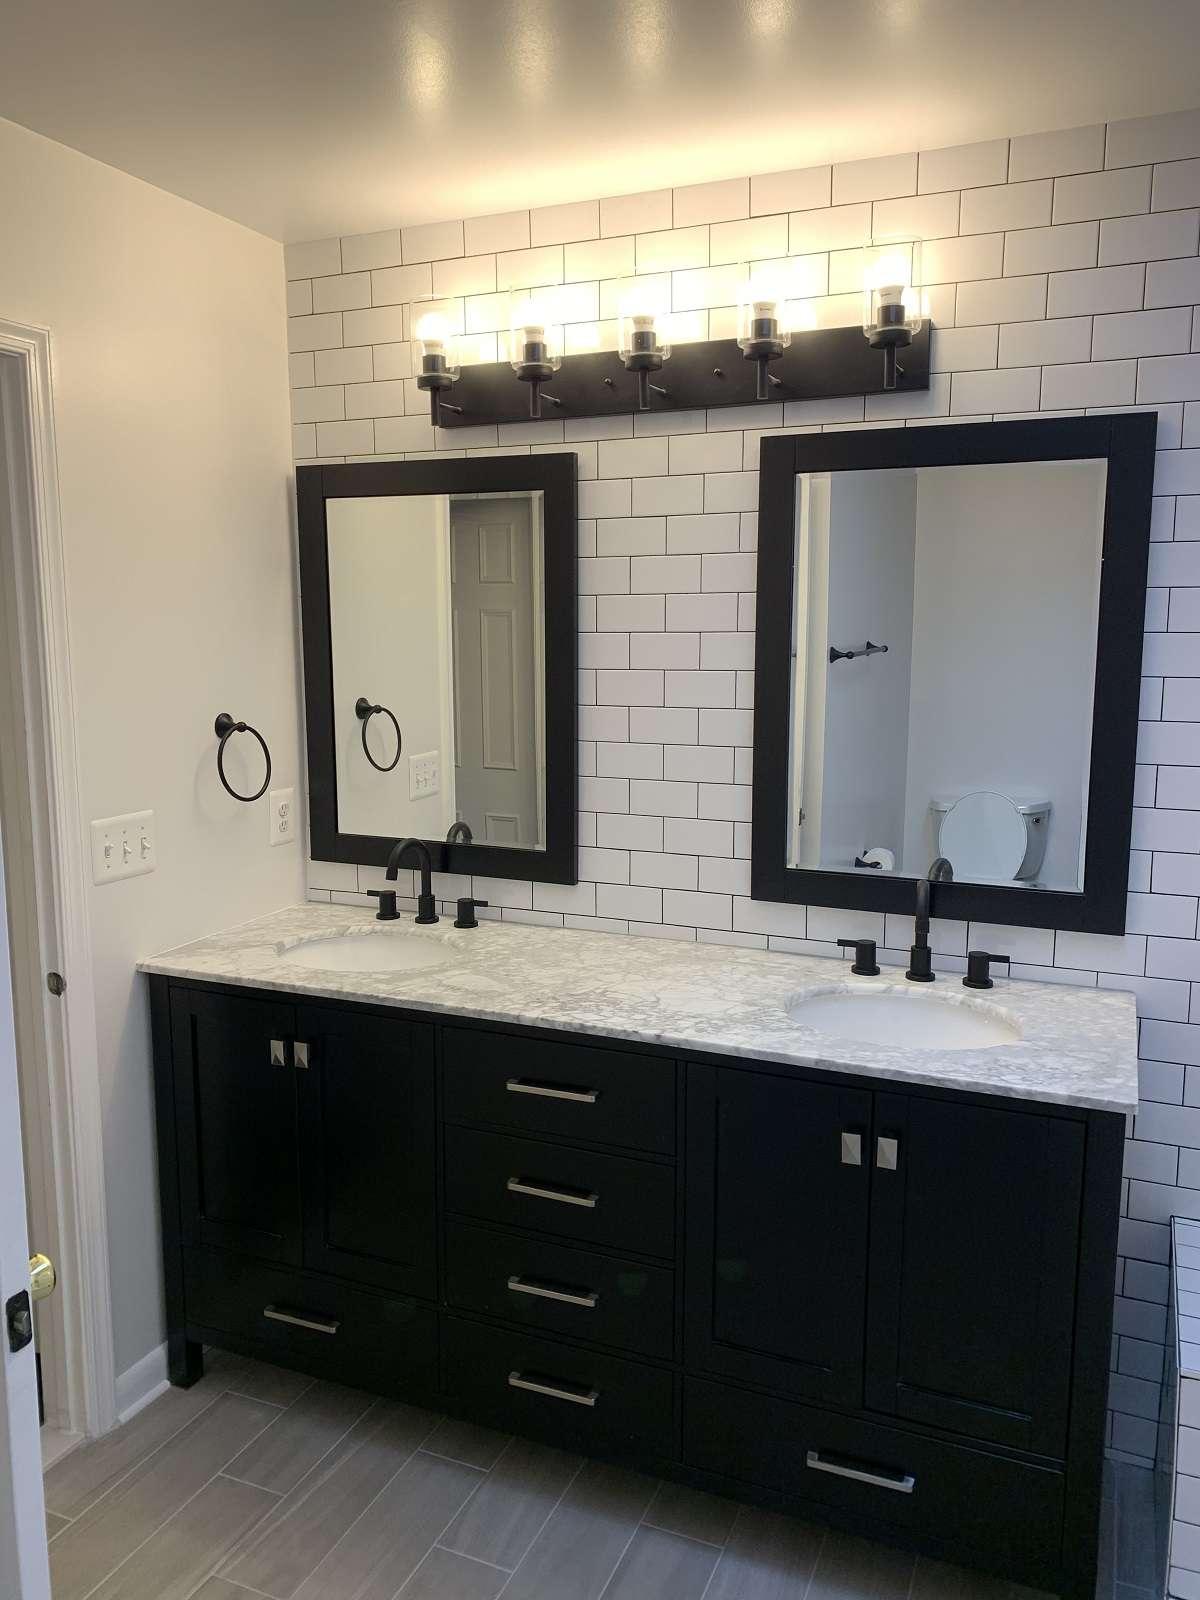 Home Services: Bathroom Renovations in Alexandria, Arlington, or Springfield, VA